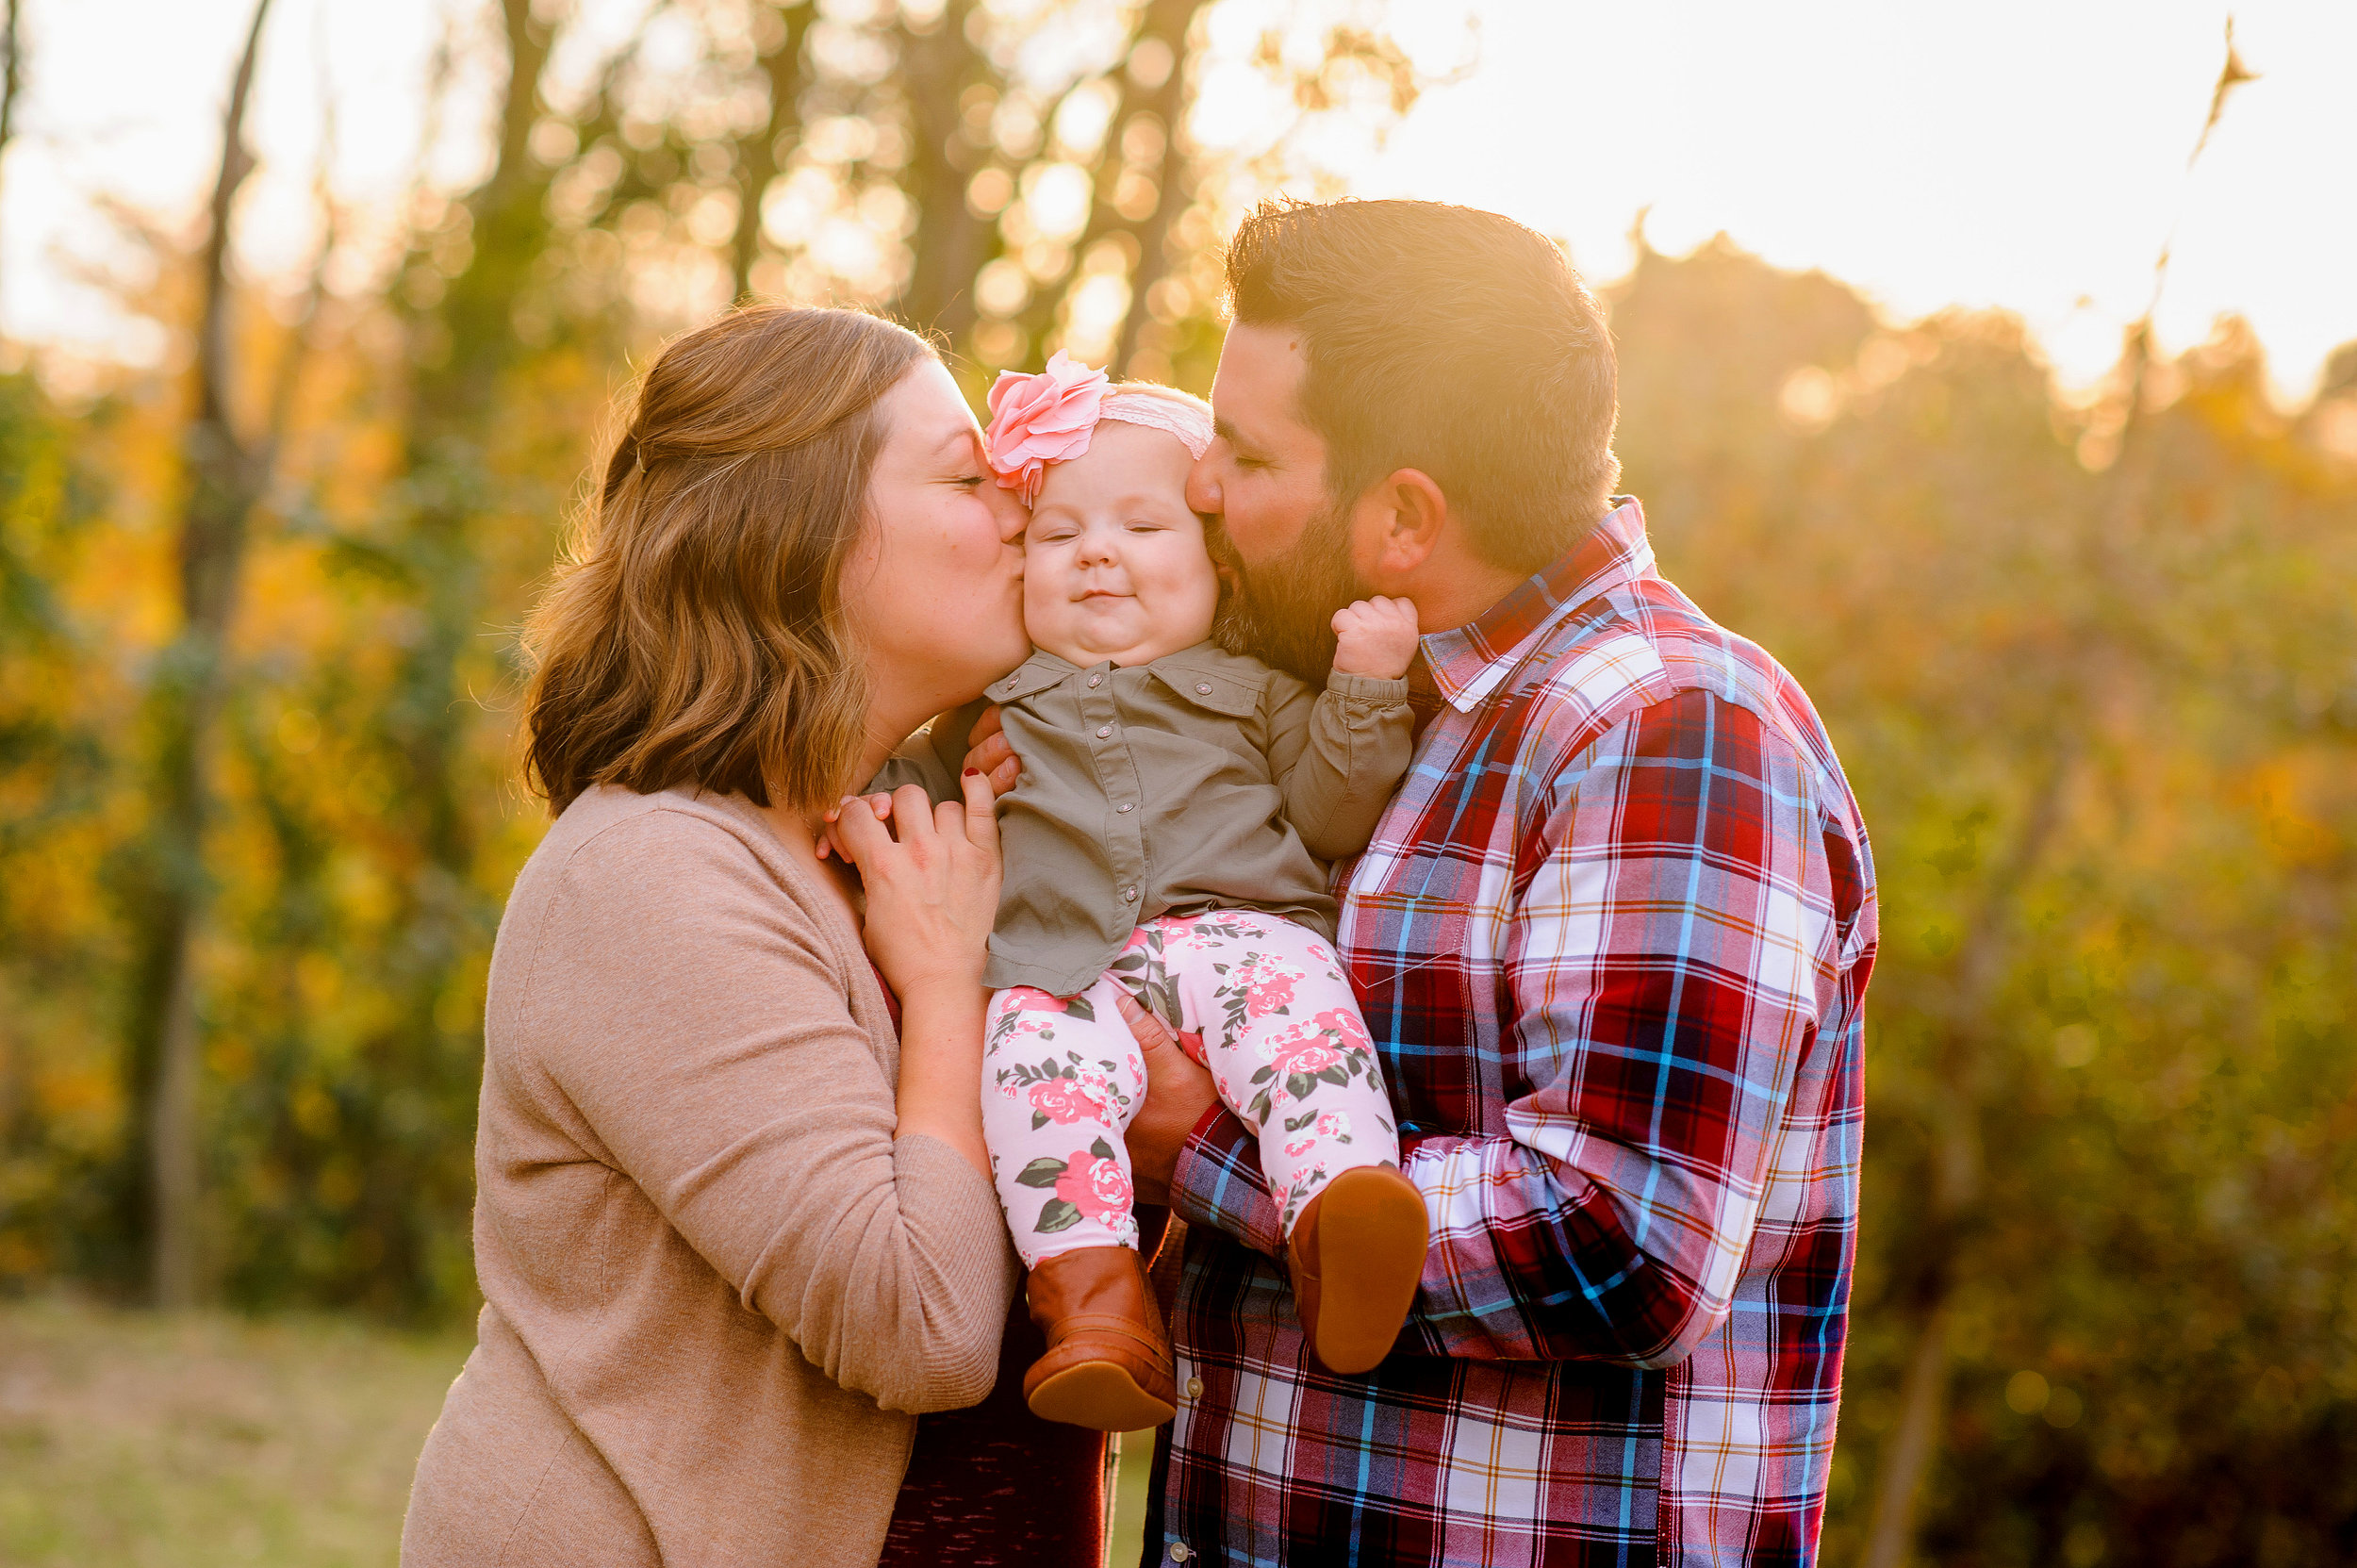 stephan-family-005-sacramento-family-photographer-katherine-nicole-photography.JPG